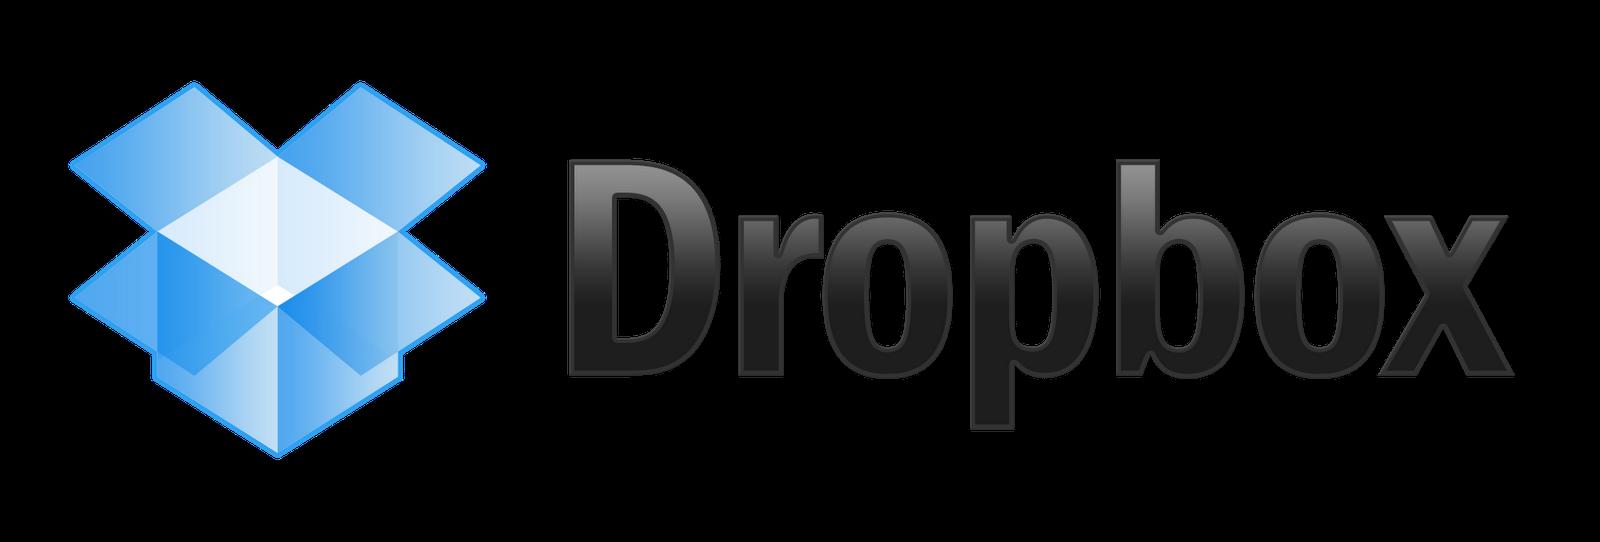 Dropbox-Logo1.png